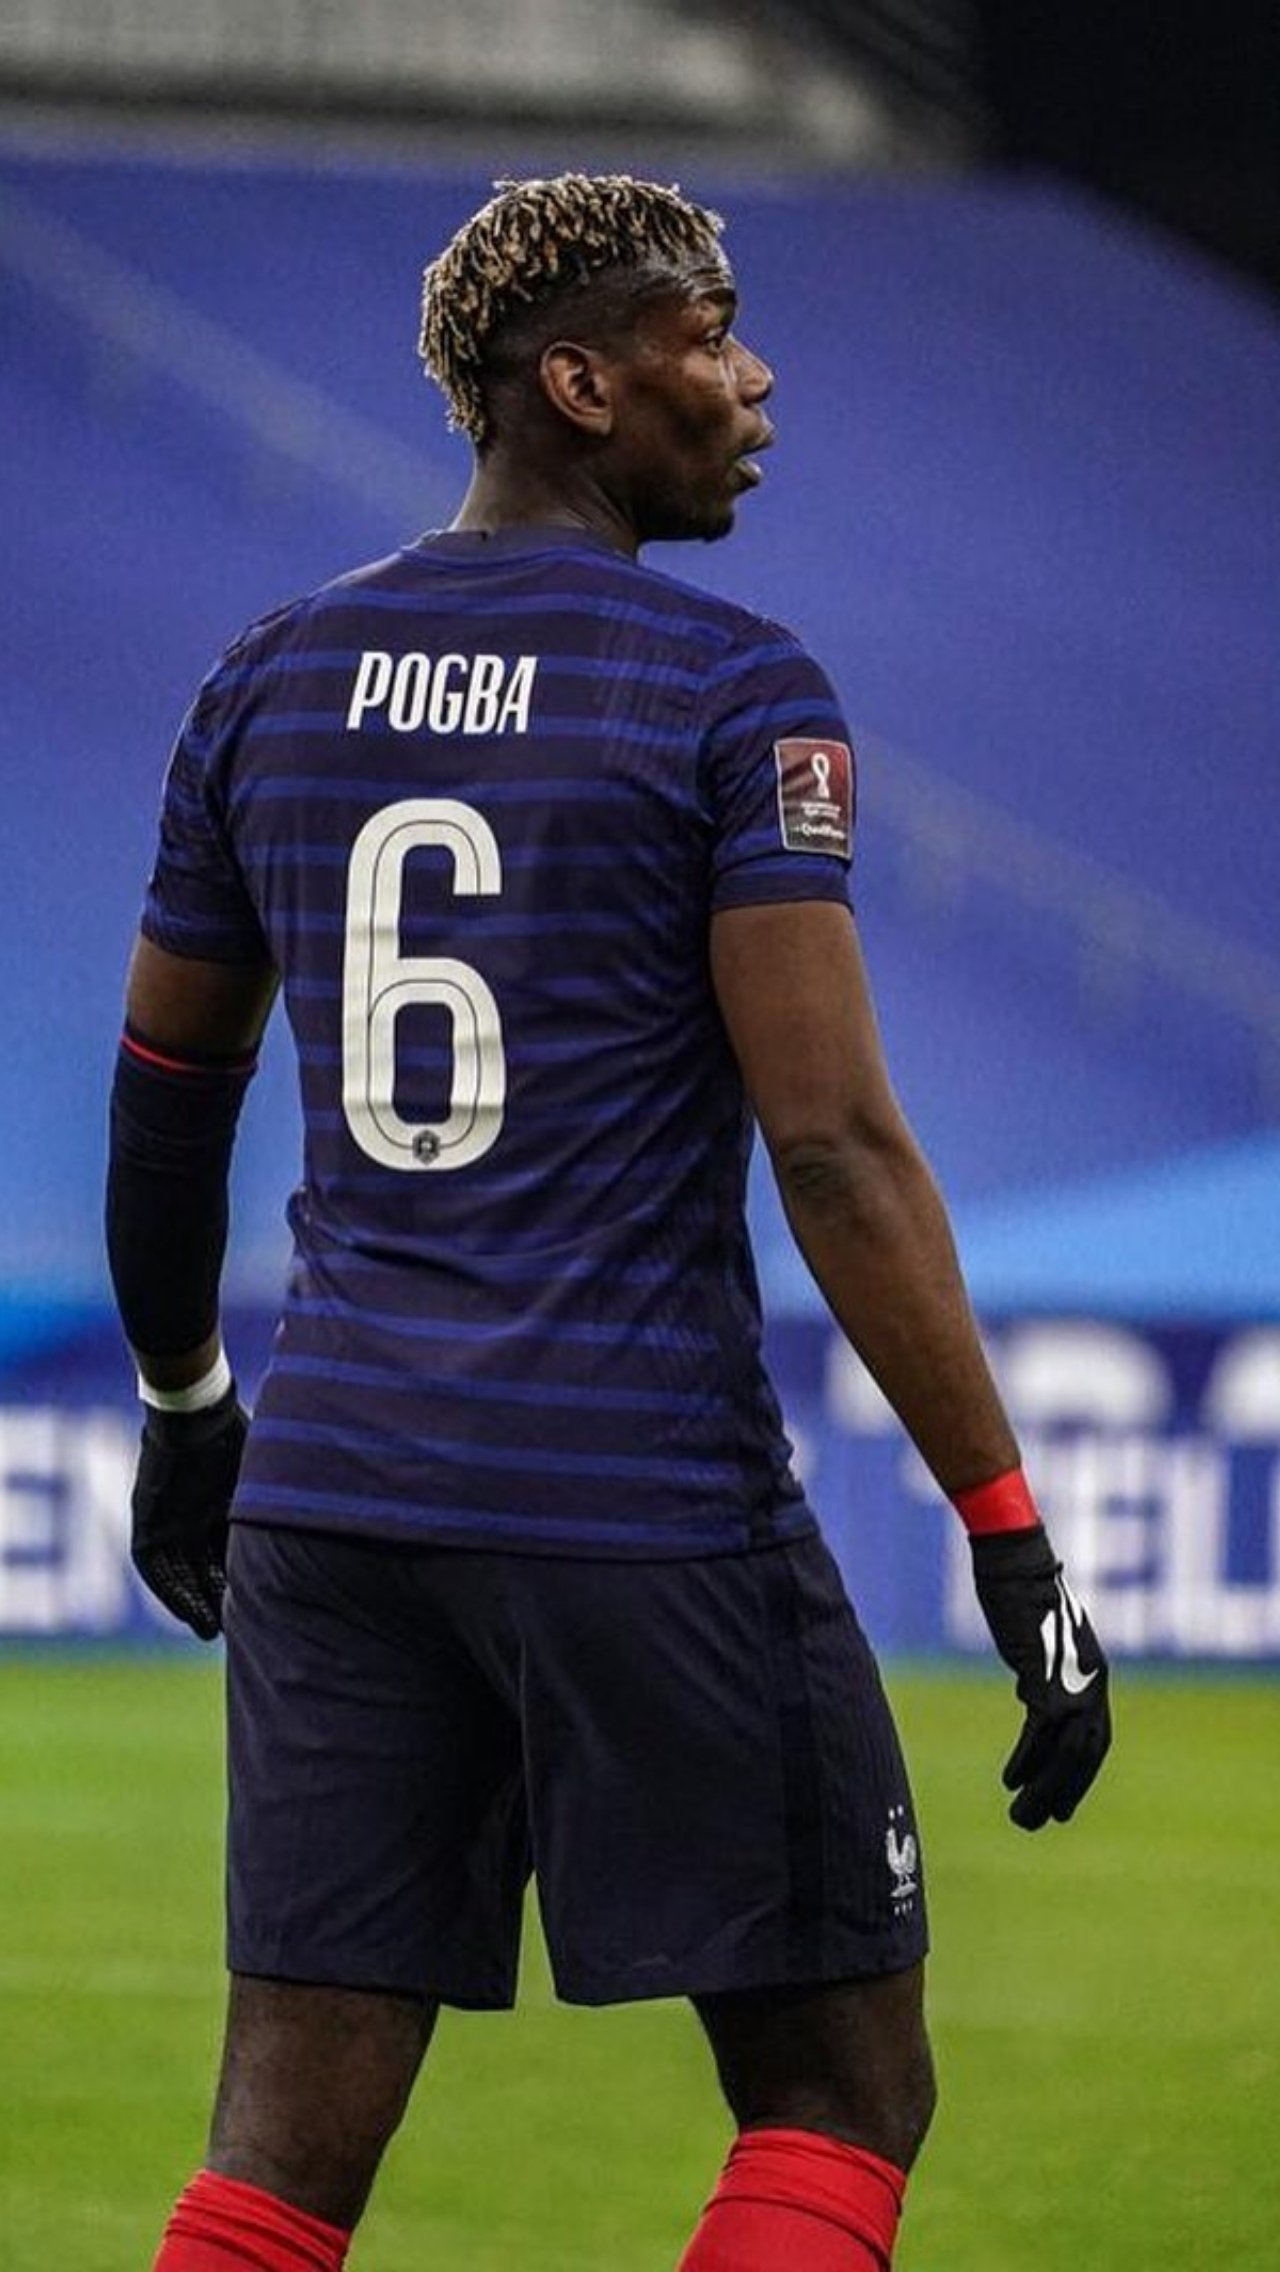 "<a href=""https://www.instagram.com/paulpogba/"" rel=""nofollow"">Поль Погба</a>"